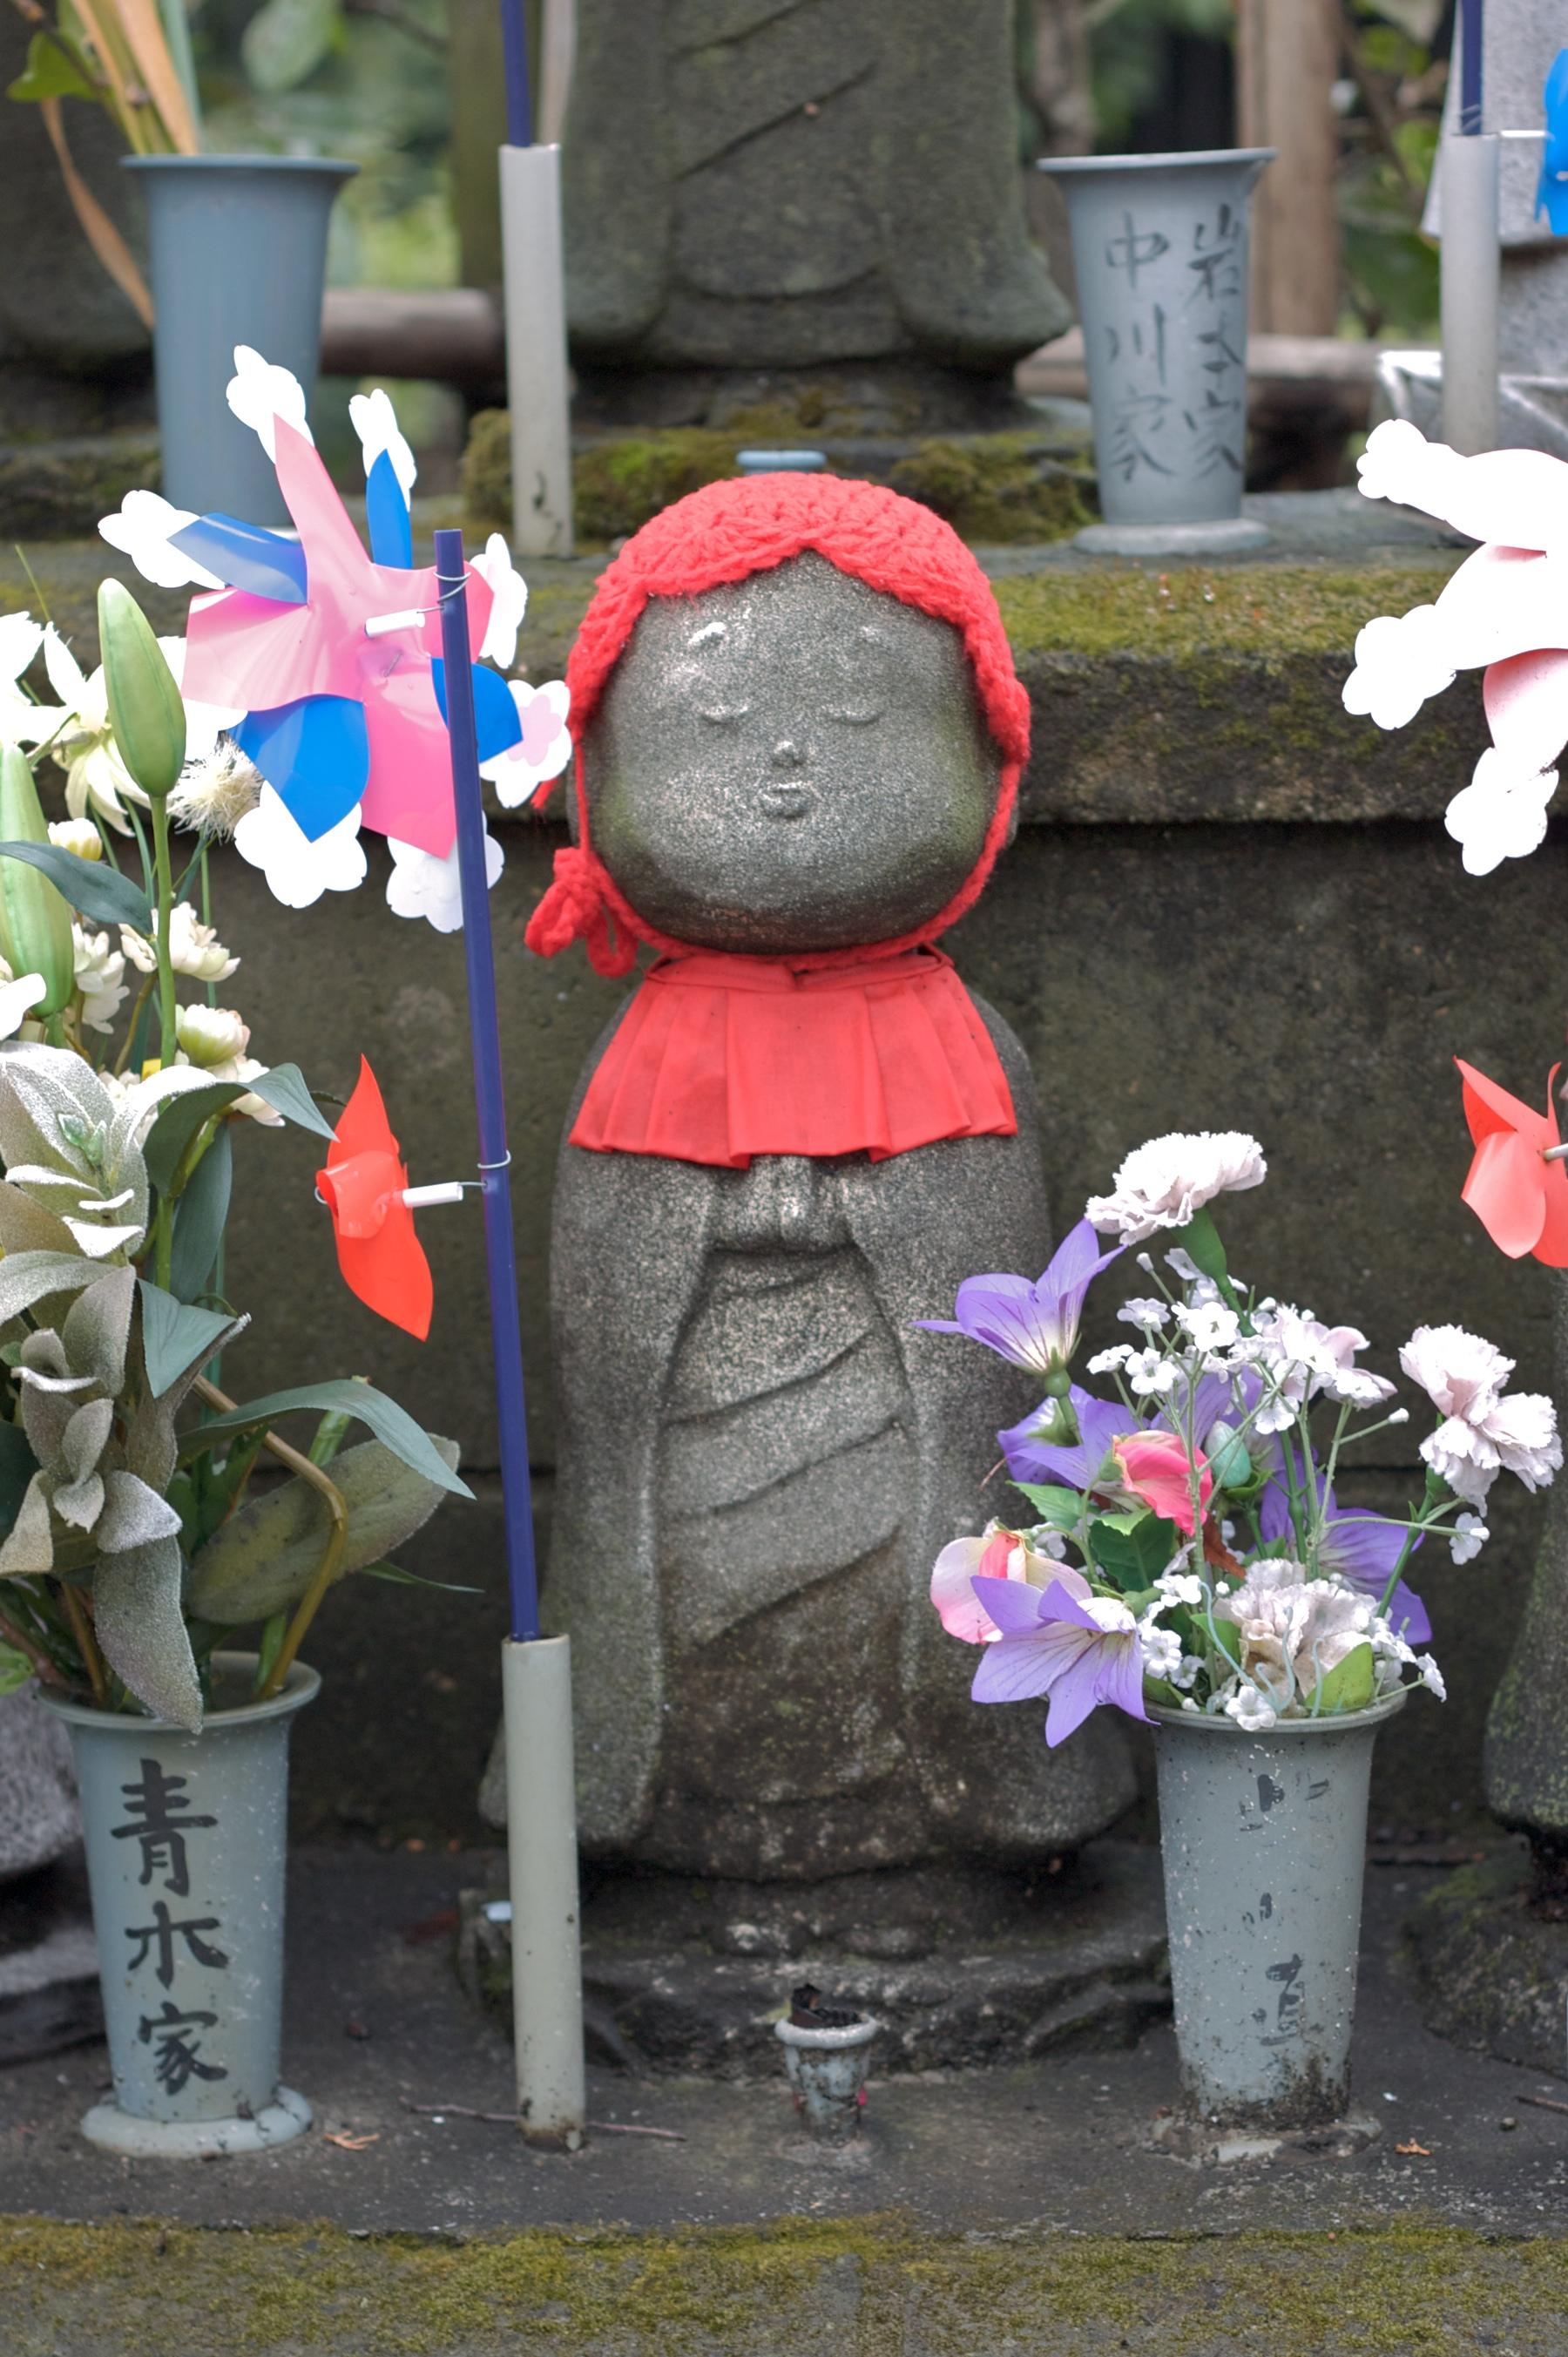 Jizo Statue Locations File:jizo Statue at Zōjō-ji